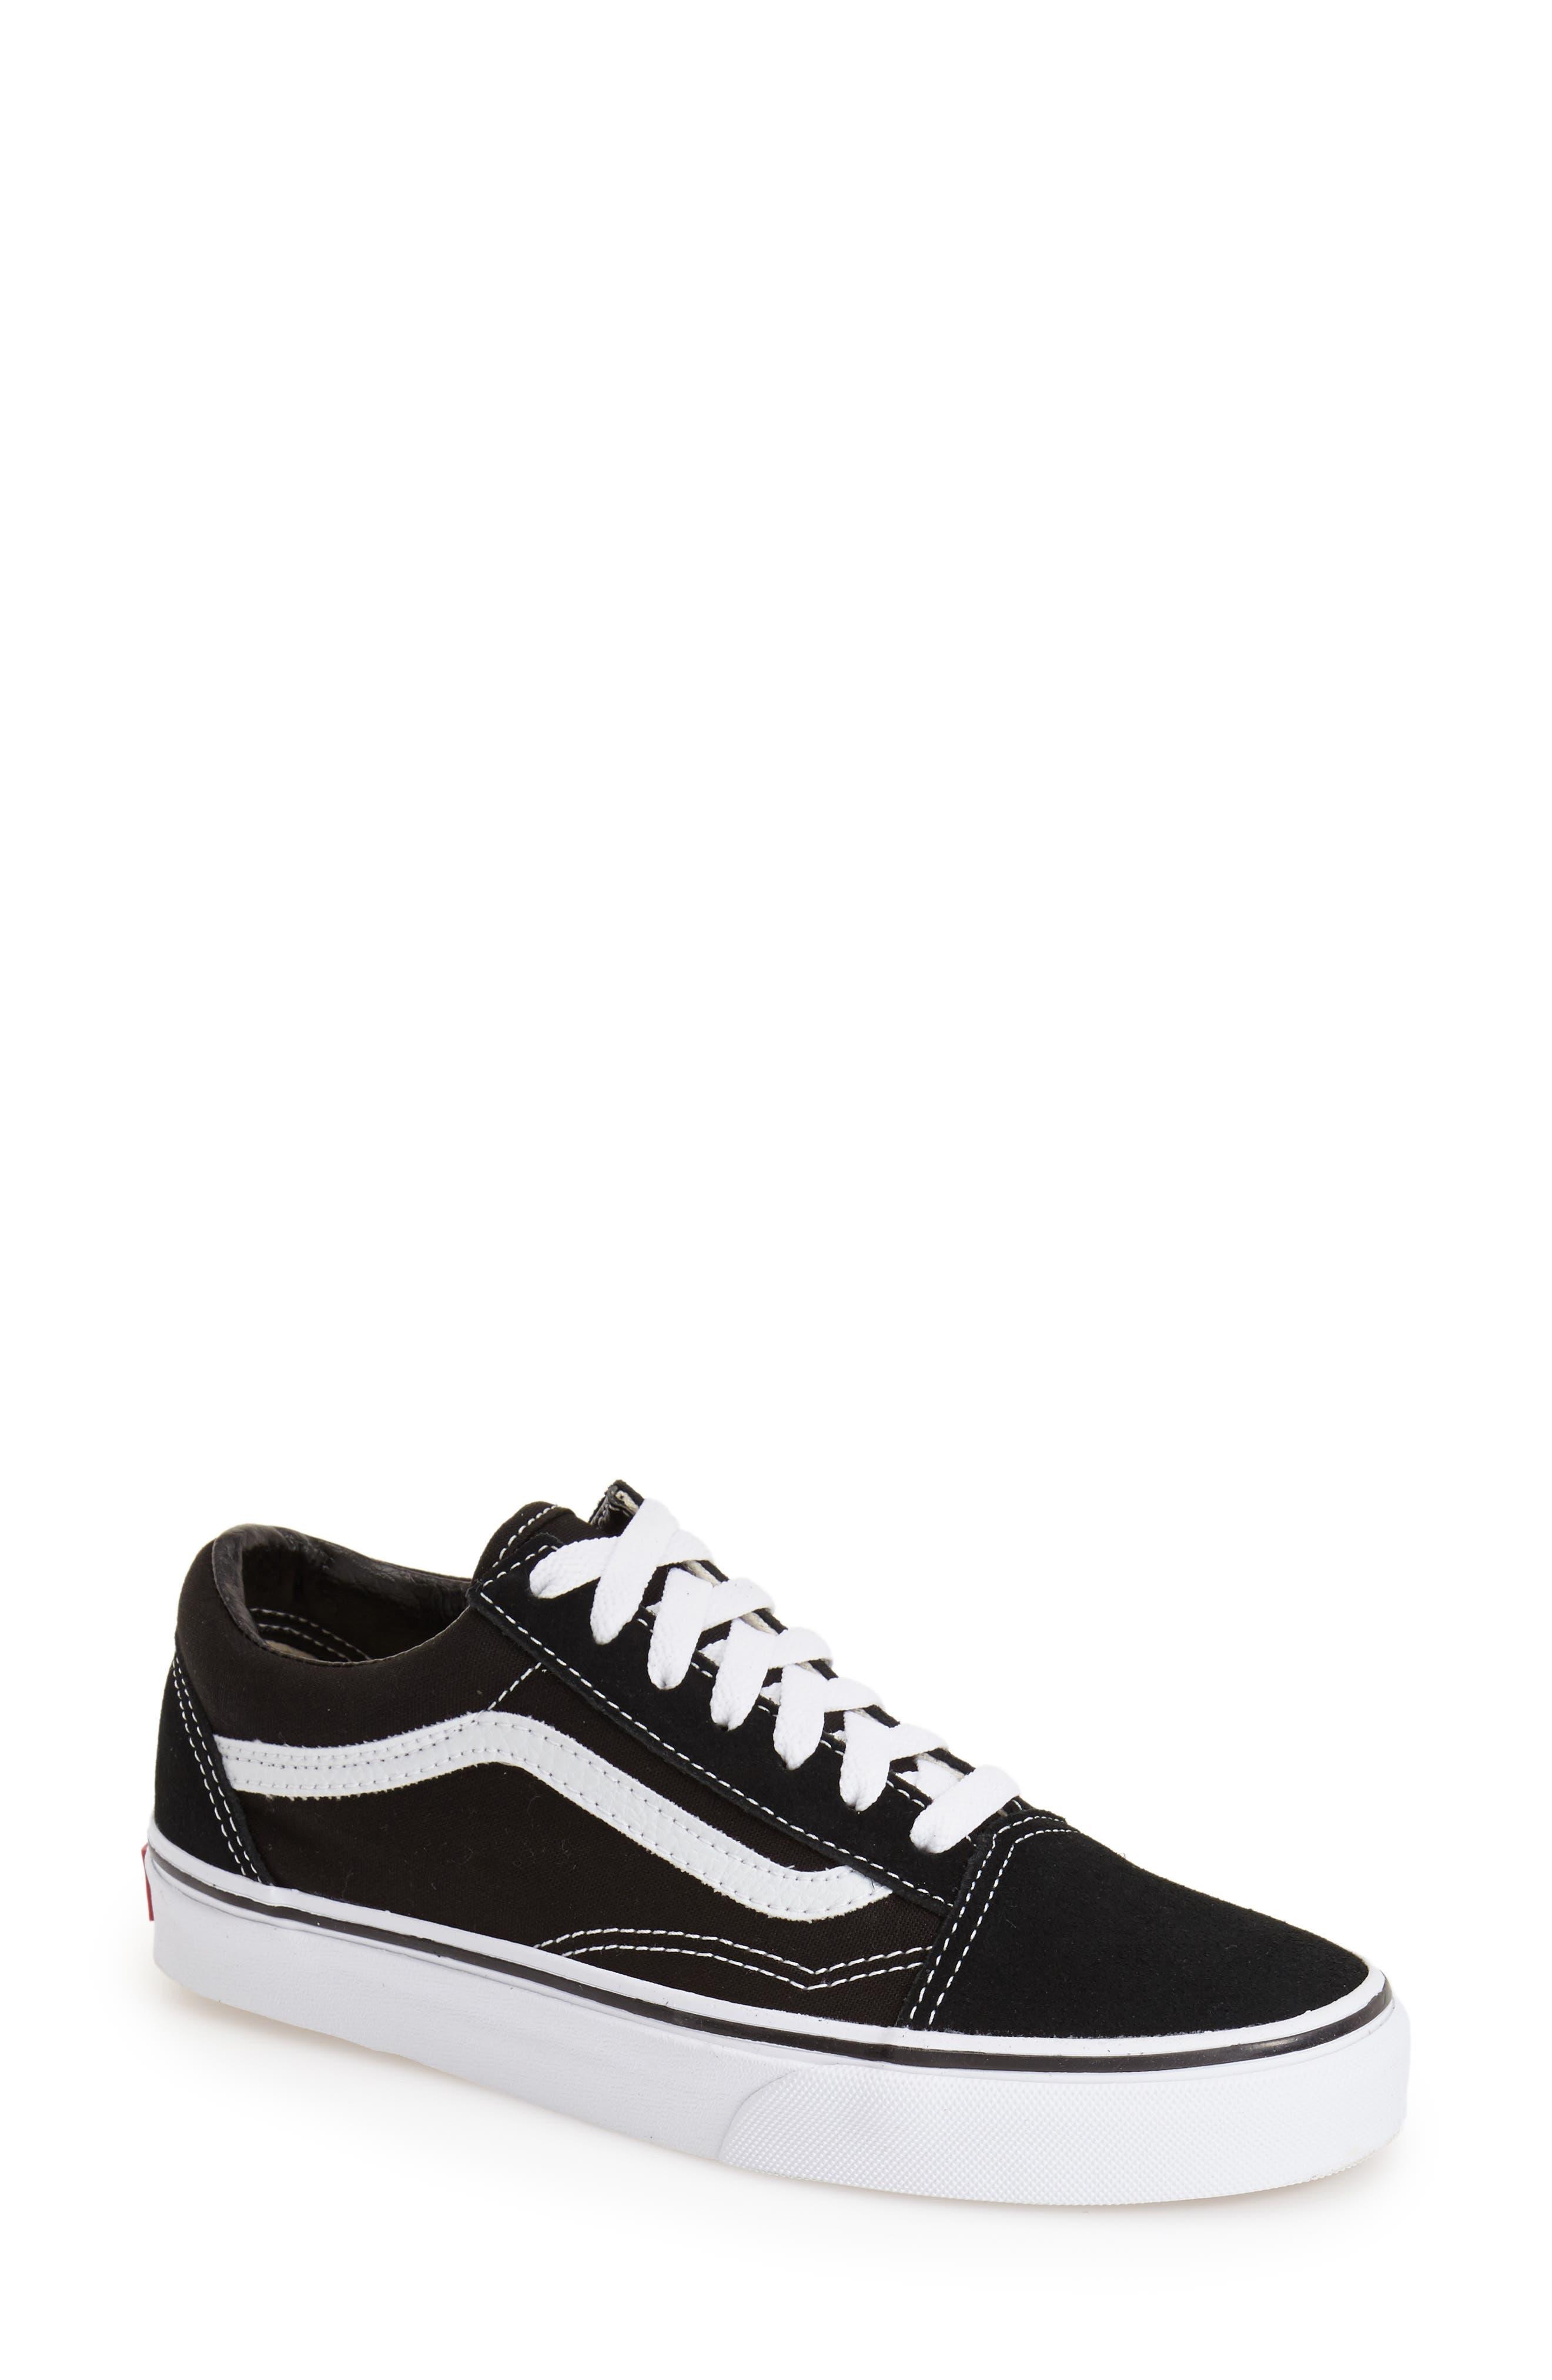 Old Skool Sneaker,                             Main thumbnail 1, color,                             Black Canvas